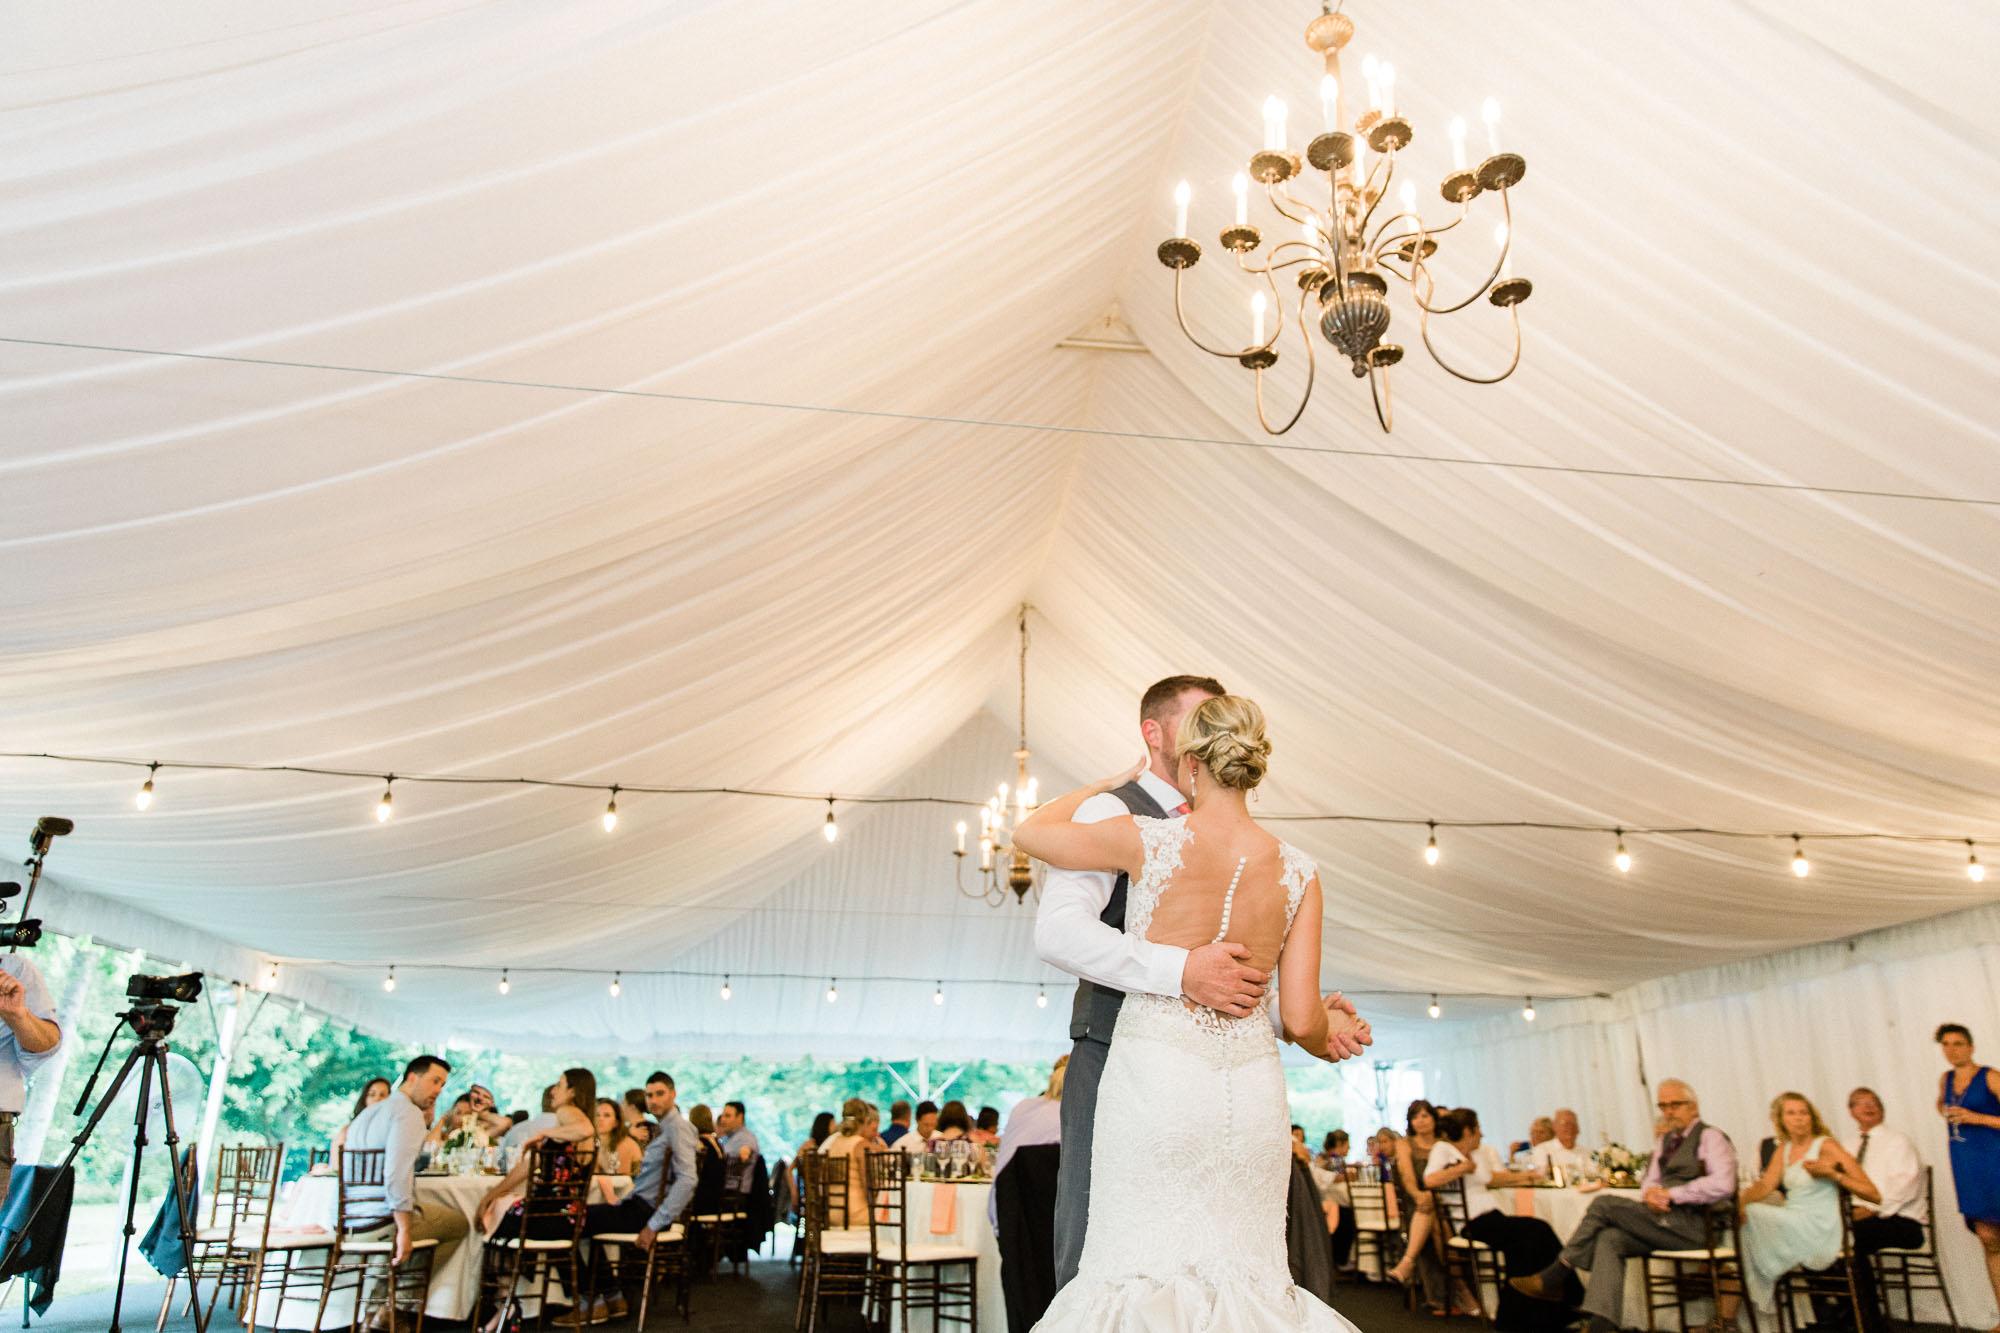 Allenberry-resort-historic-pennsylvania-wedding-10471.jpg